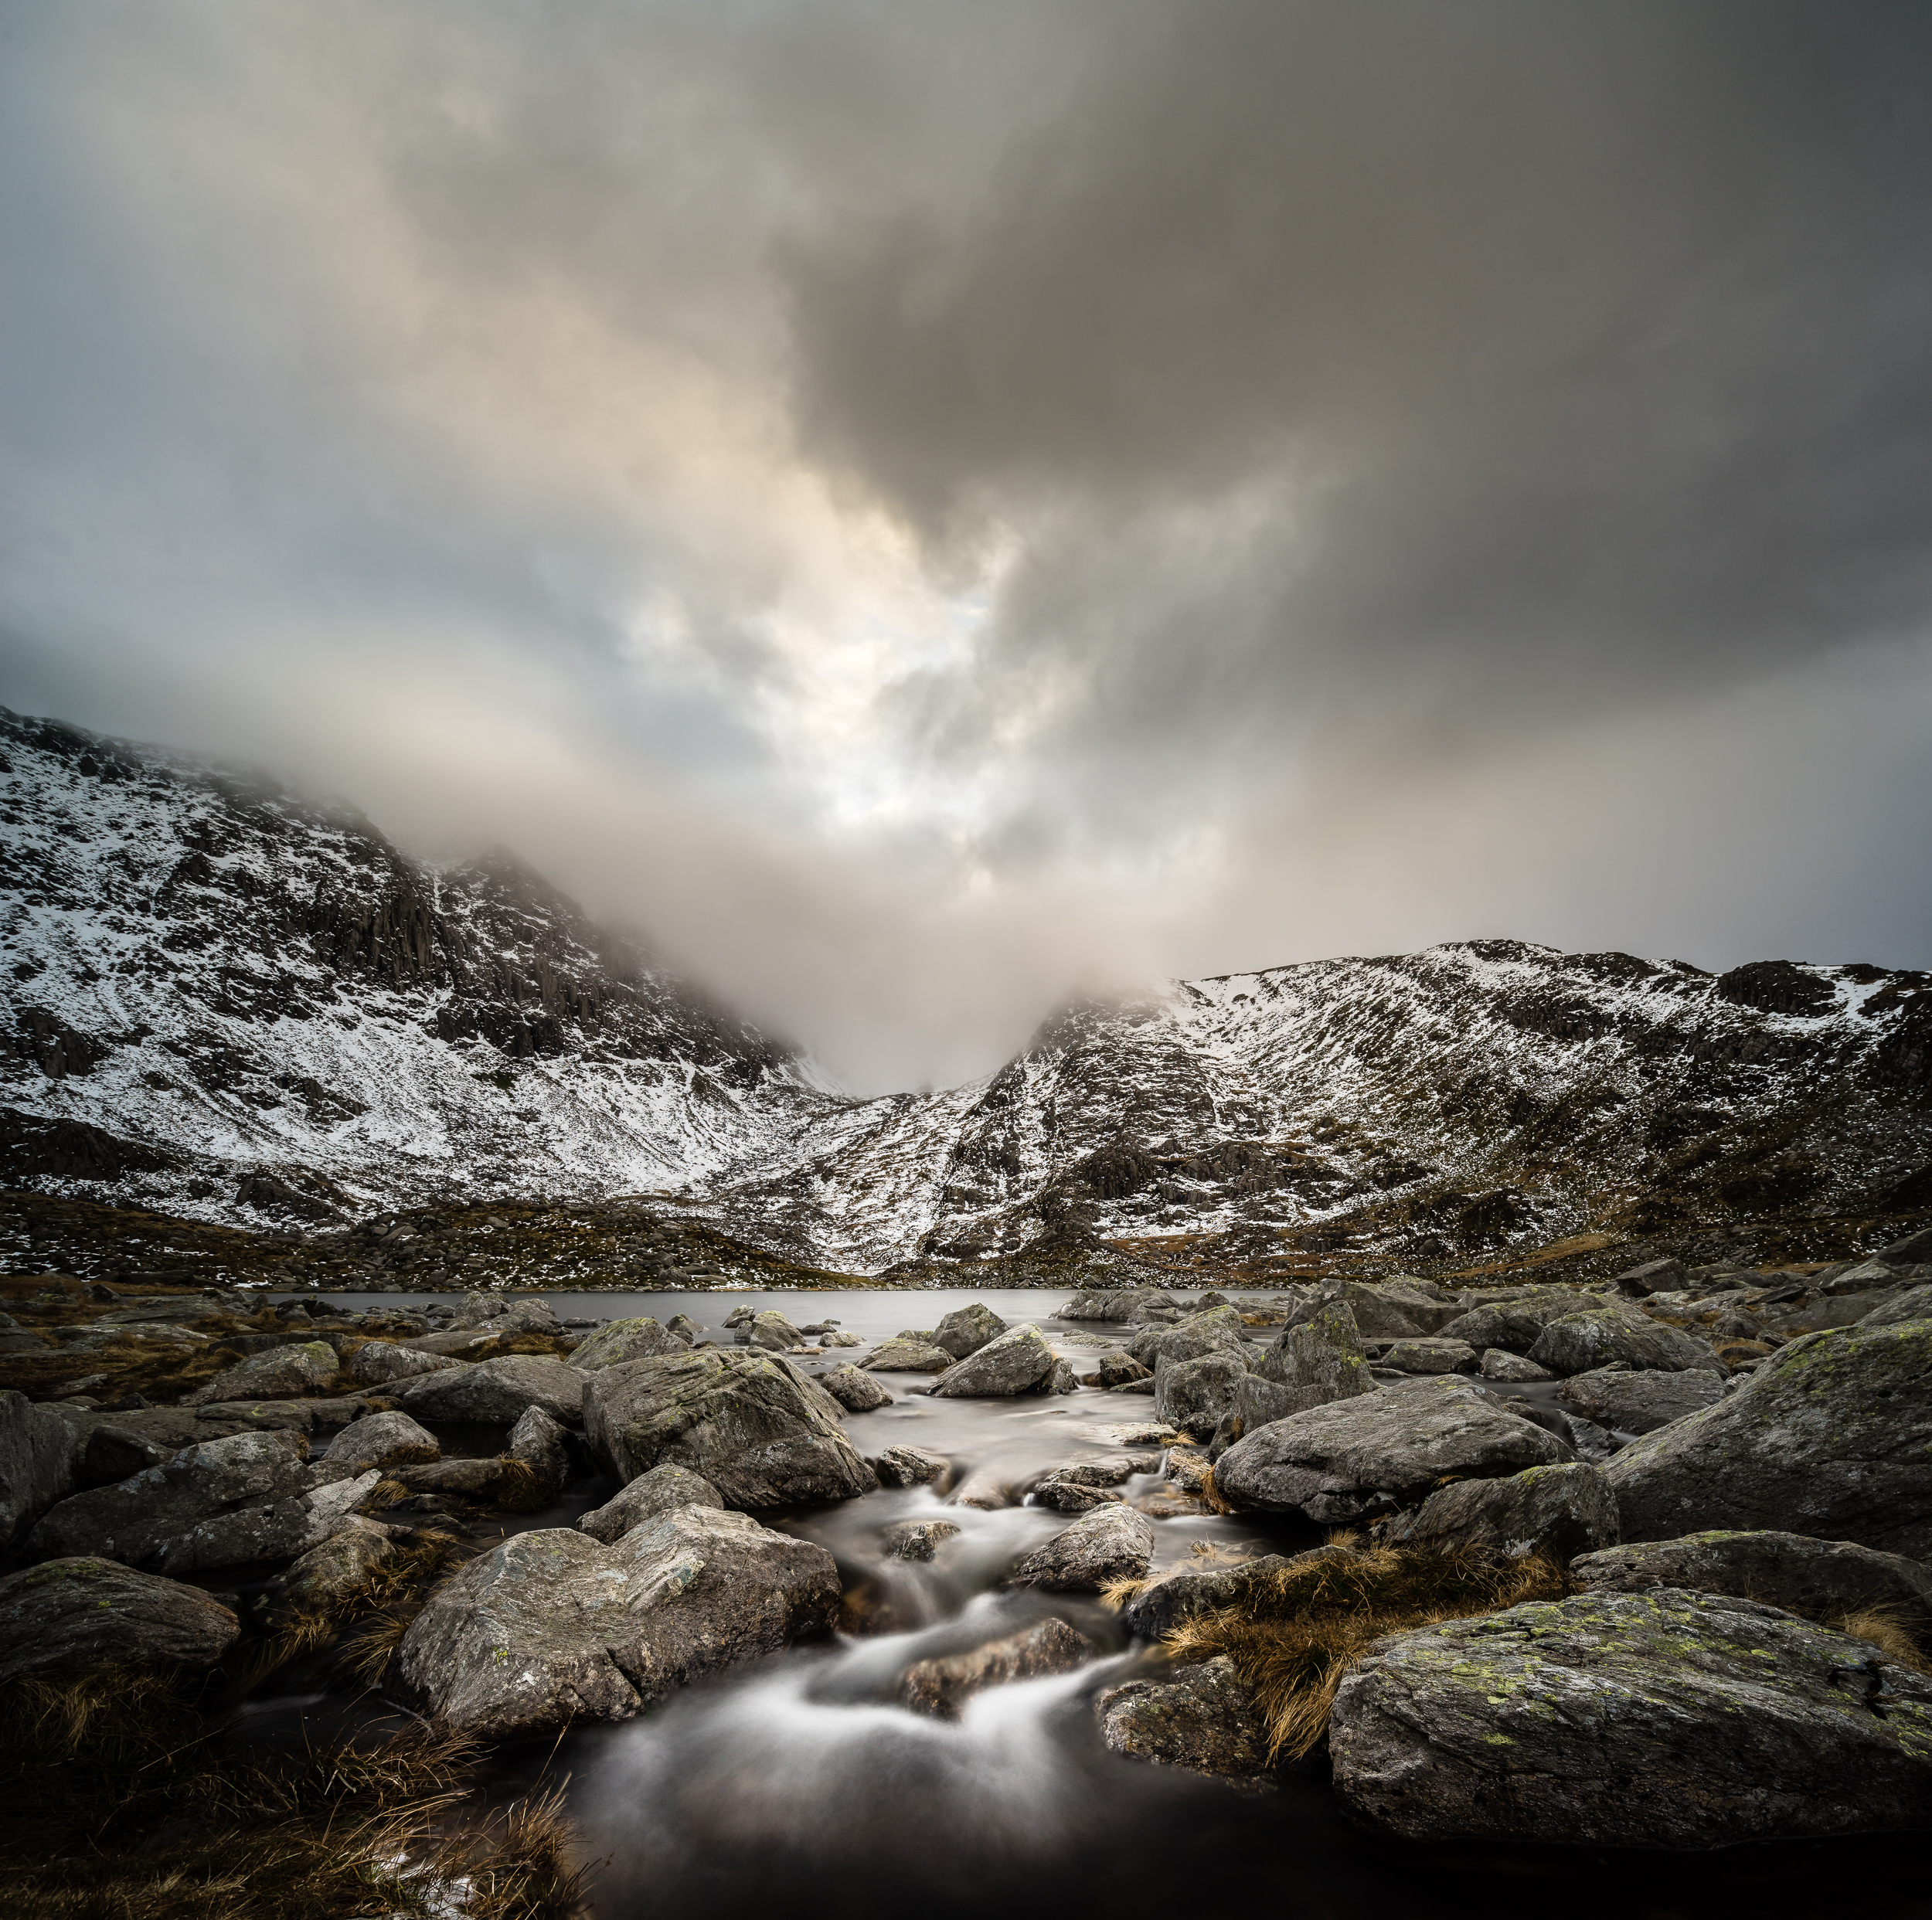 Standing in a stream from Llyn Bochlwyd. 18mm, ISO 100, f/8, 13 seconds.